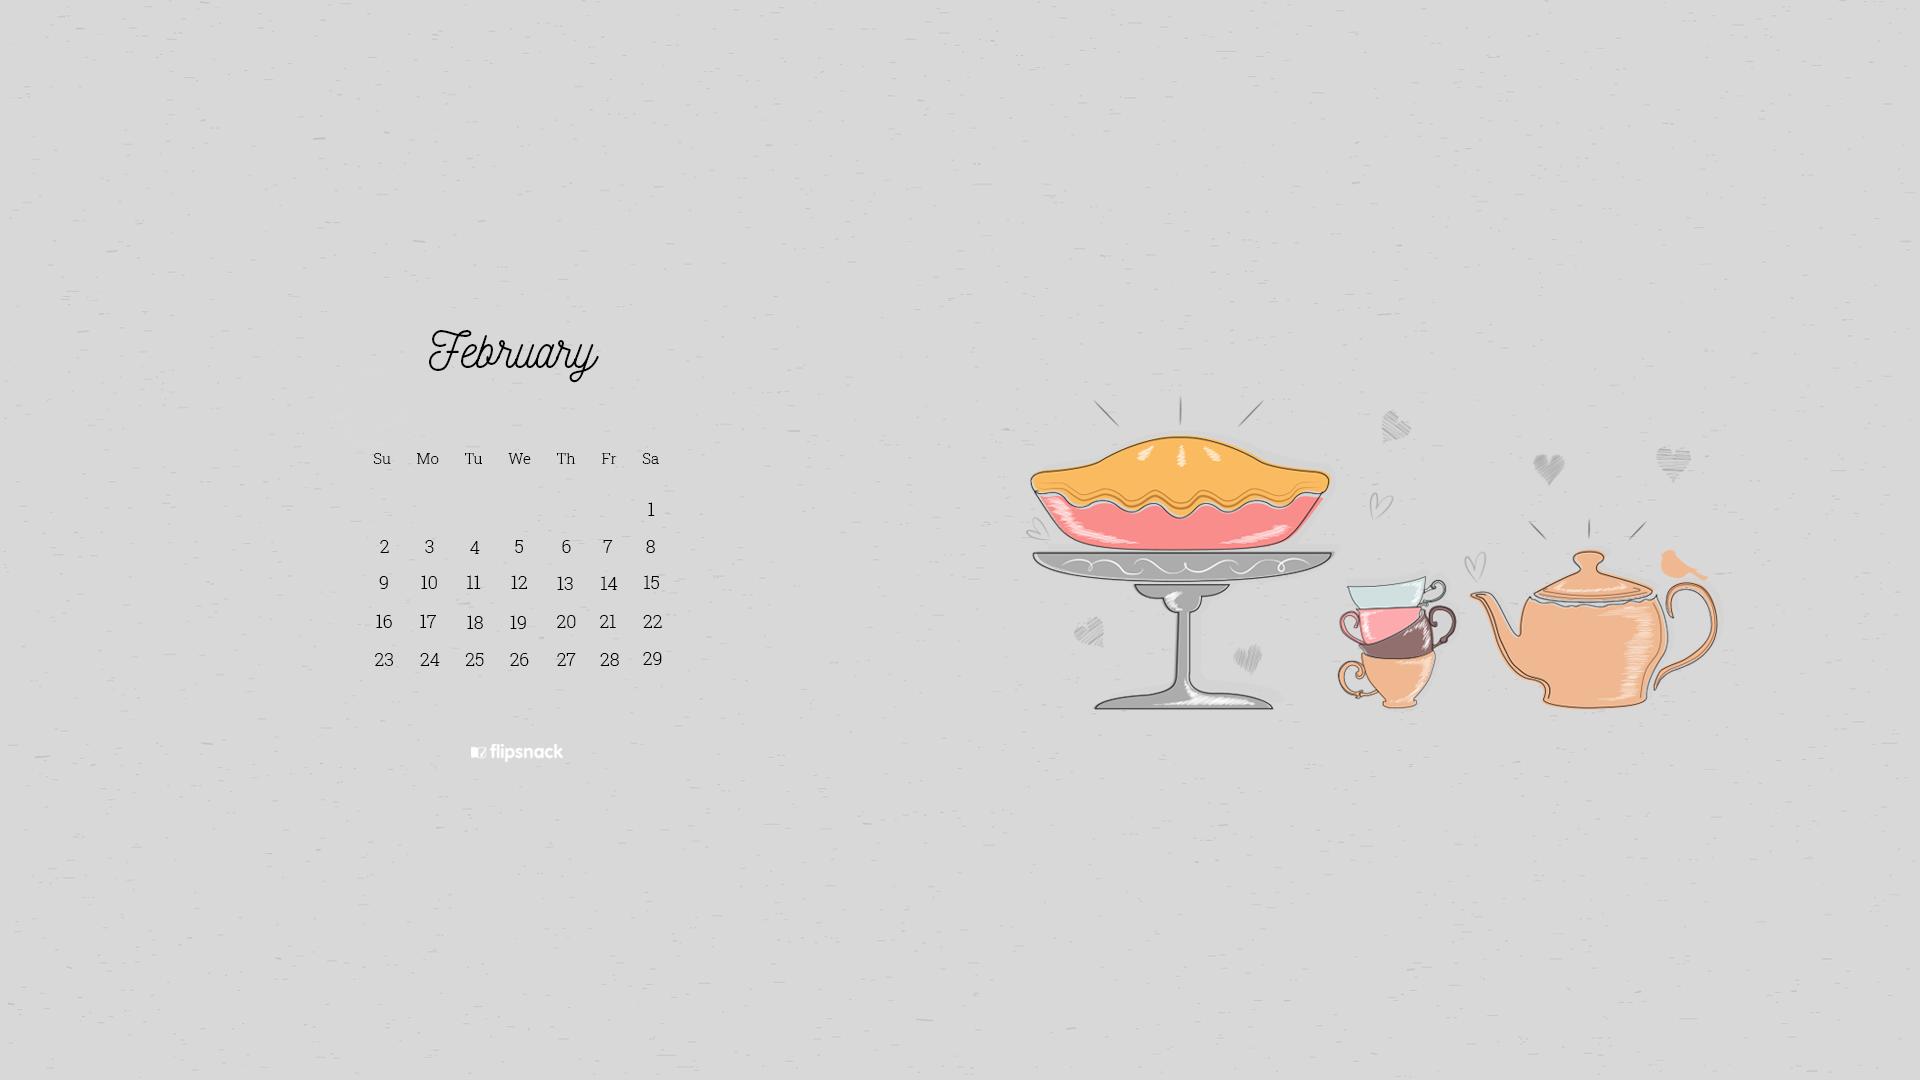 2020 wallpaper calendars January   December   Flipsnack Blog 1920x1080